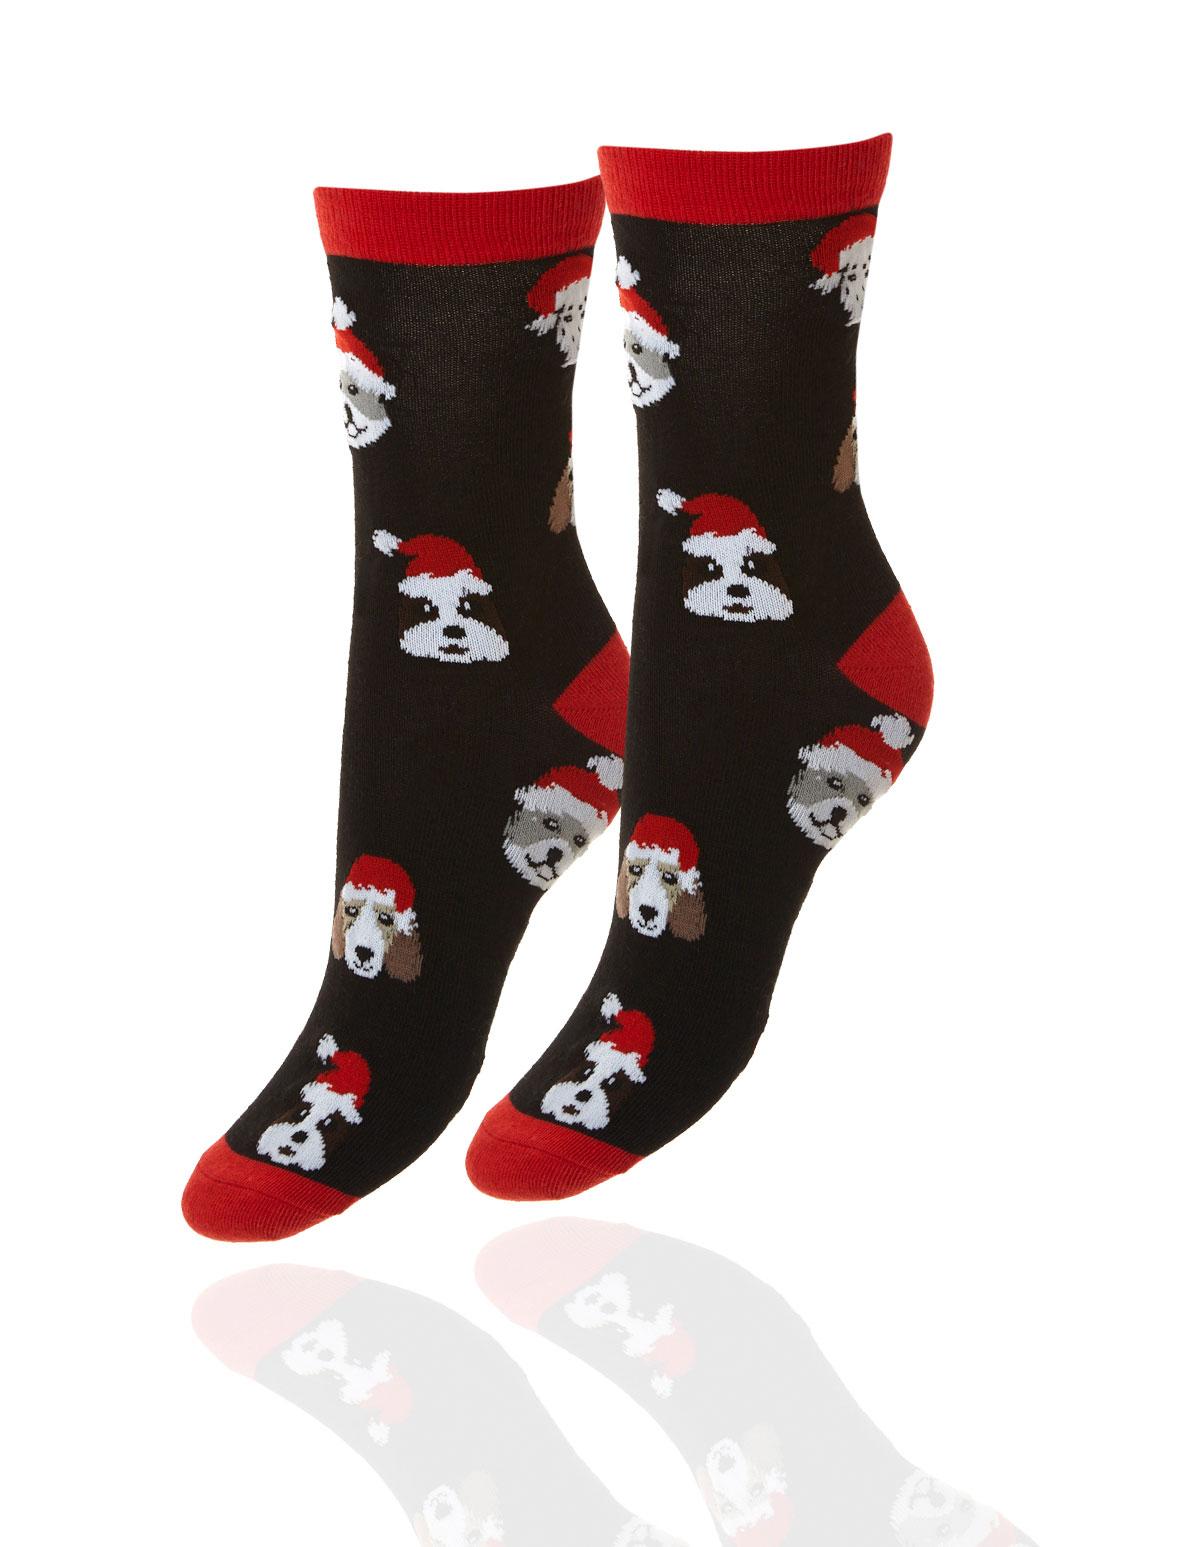 Cody The Dog Crew Printed Mid Calf Socks ChalkTalkSPORTS Multiple Sizes